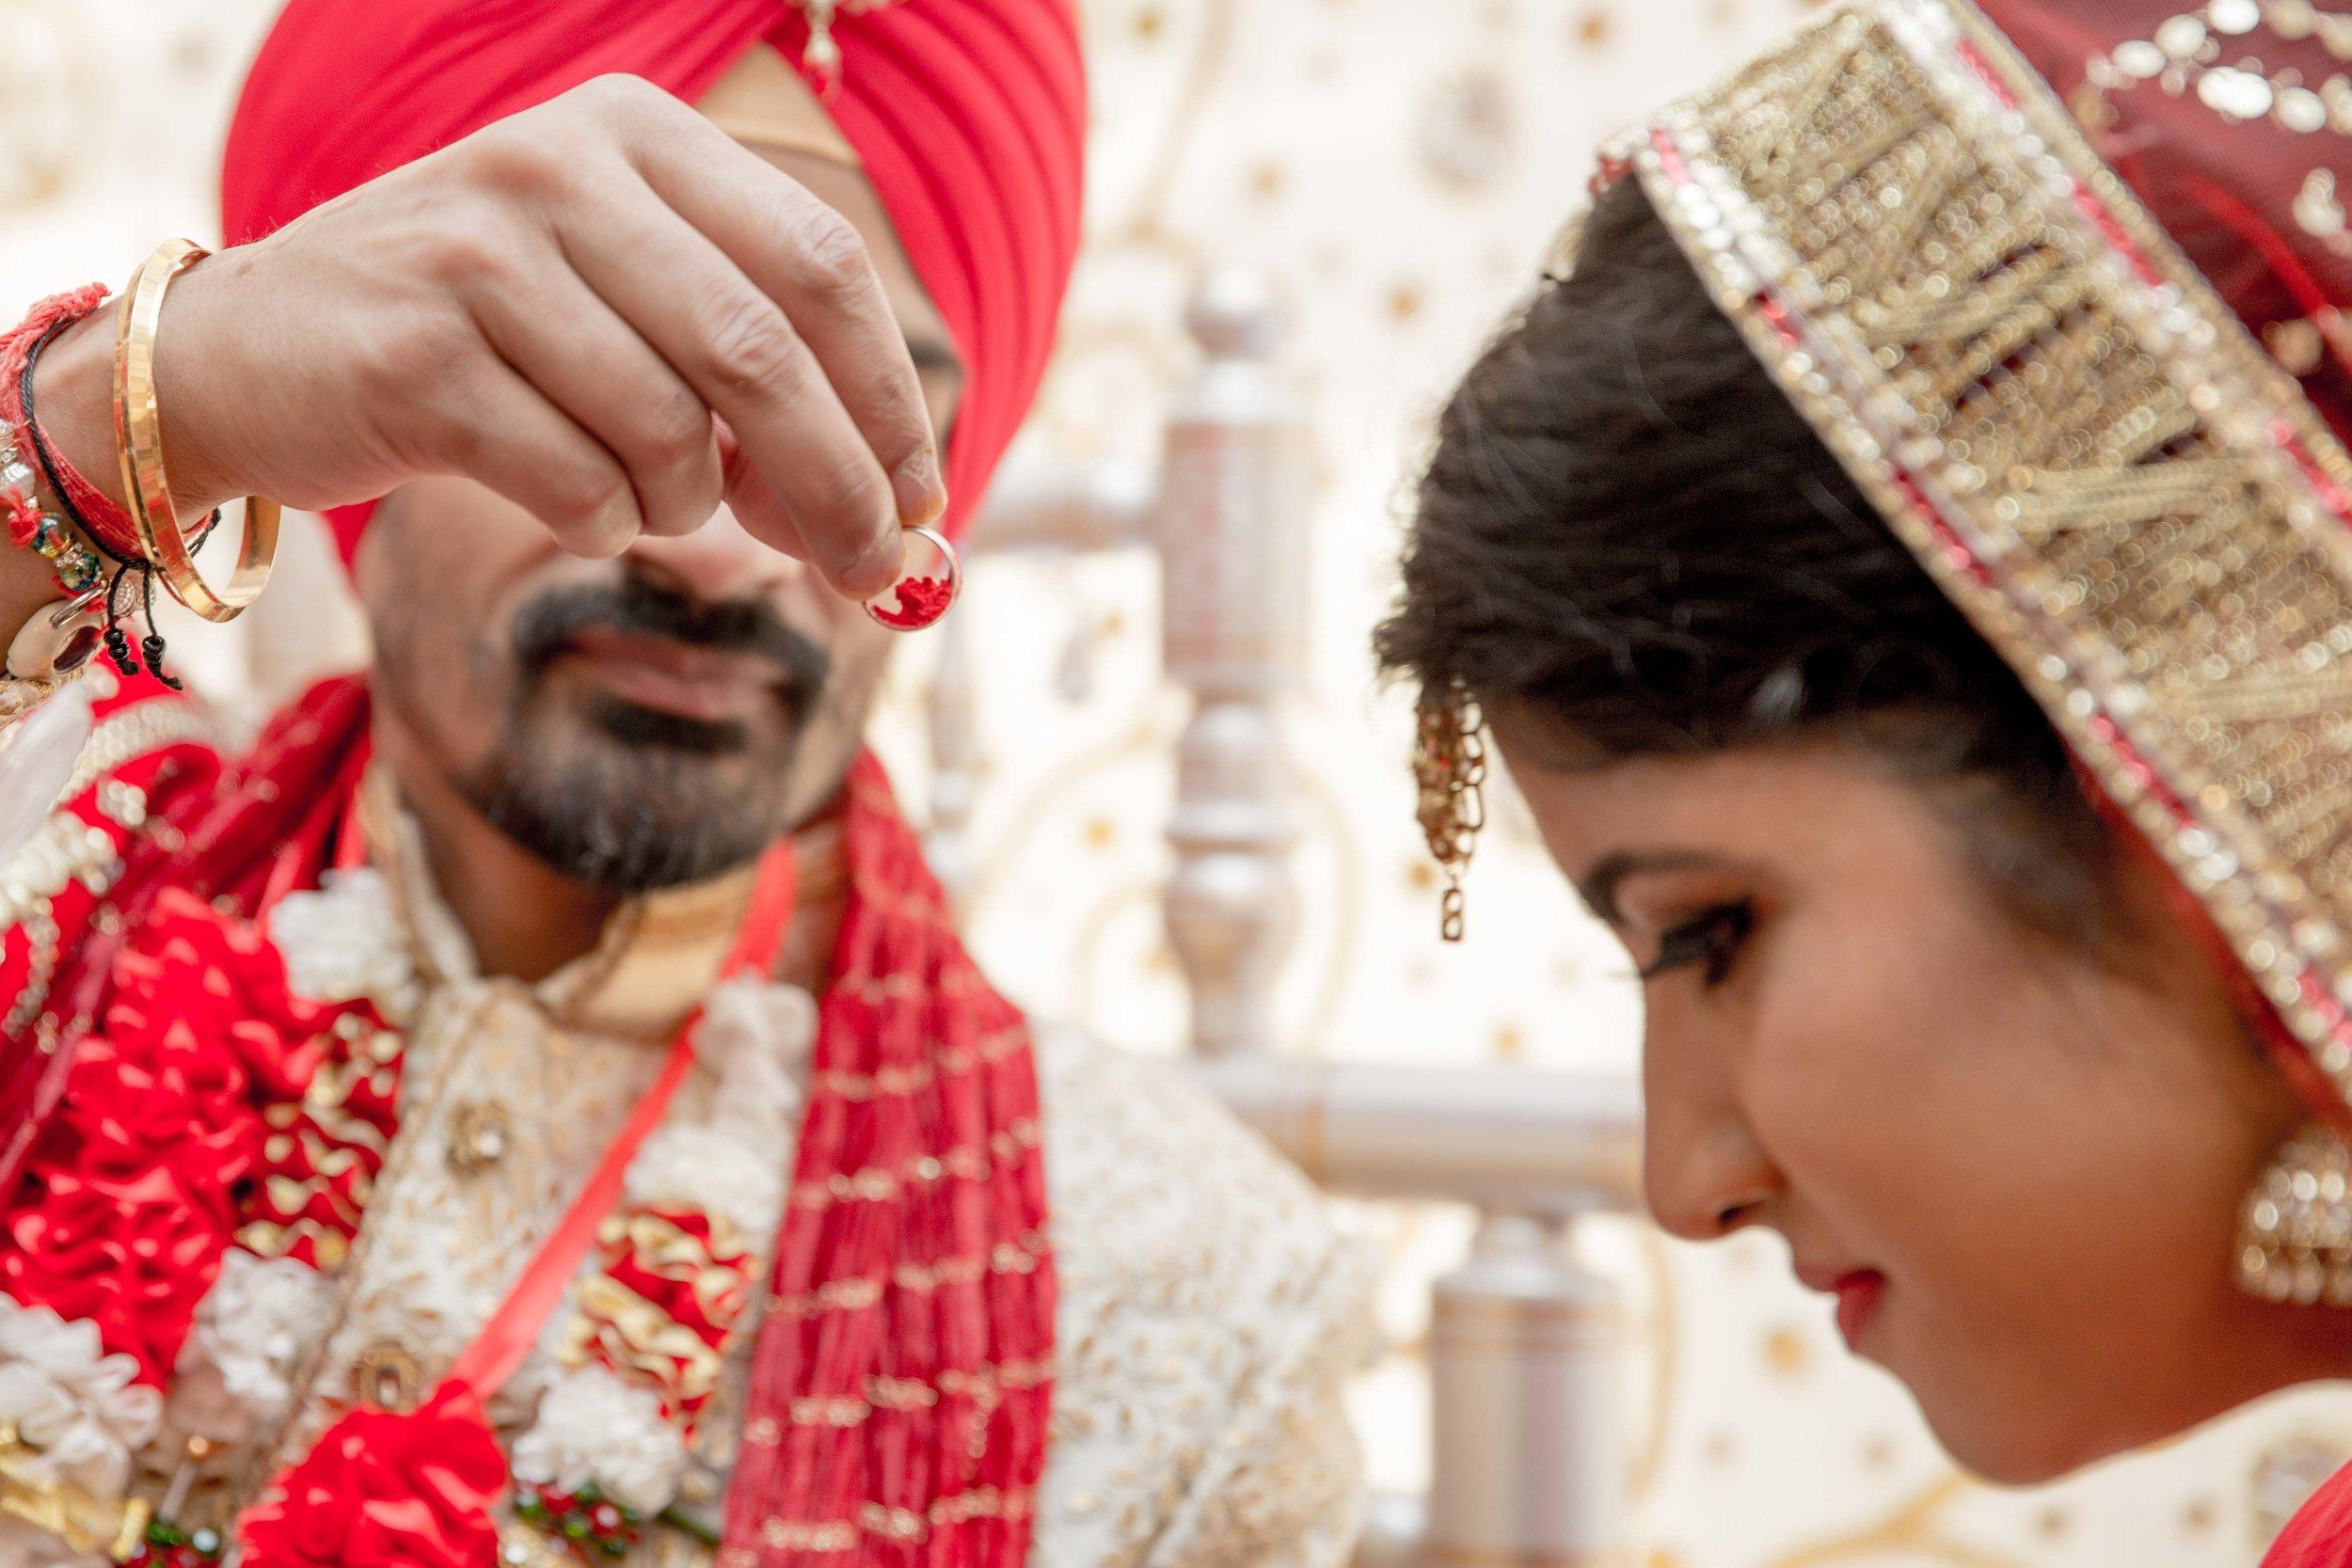 ramada-park-hall-hotel-birmingham-wolverhampton-hindu-wedding-asian-wedding-photography-natalia-smith-photography-26.jpg